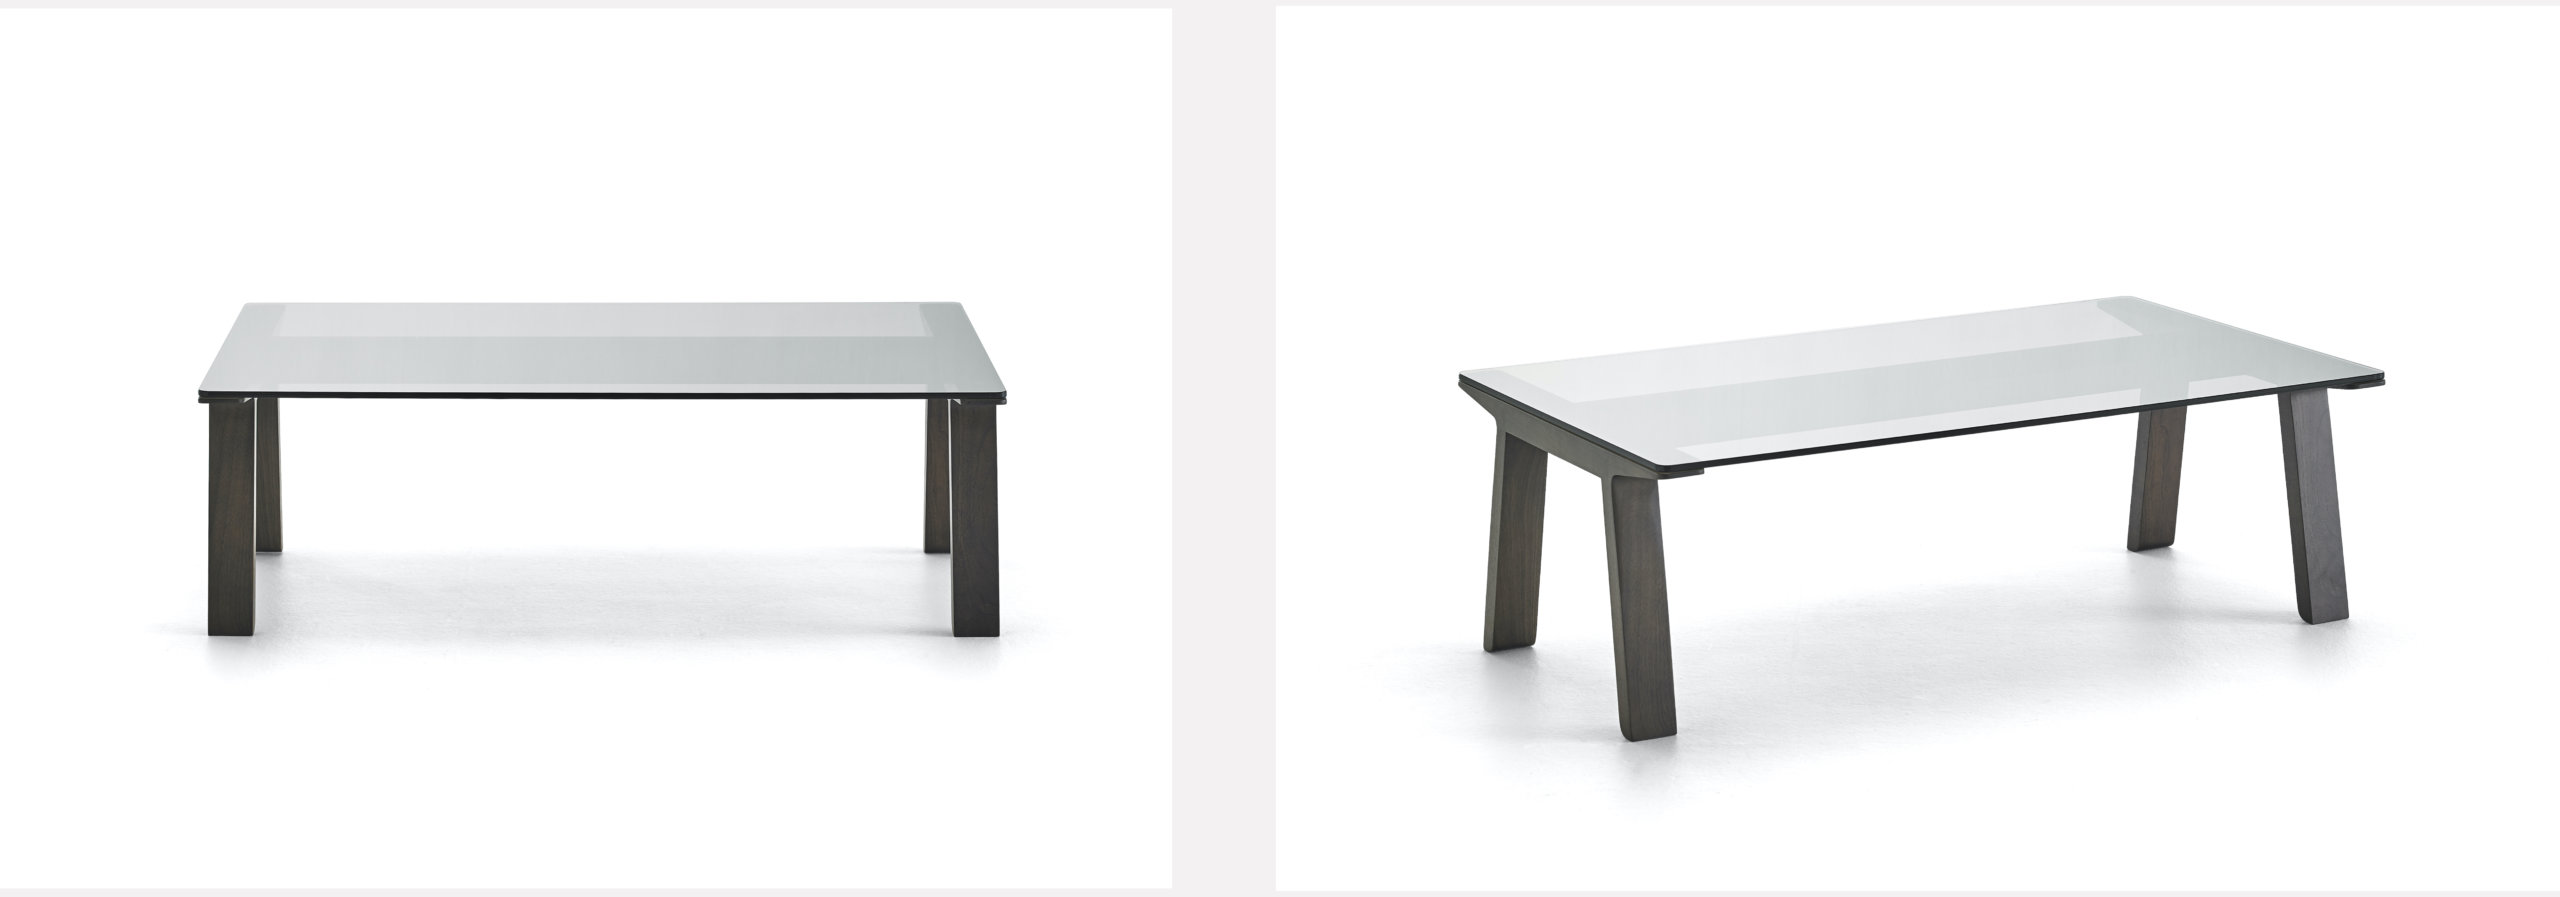 MITIS_COFFE_TABLE_SLIDE_4